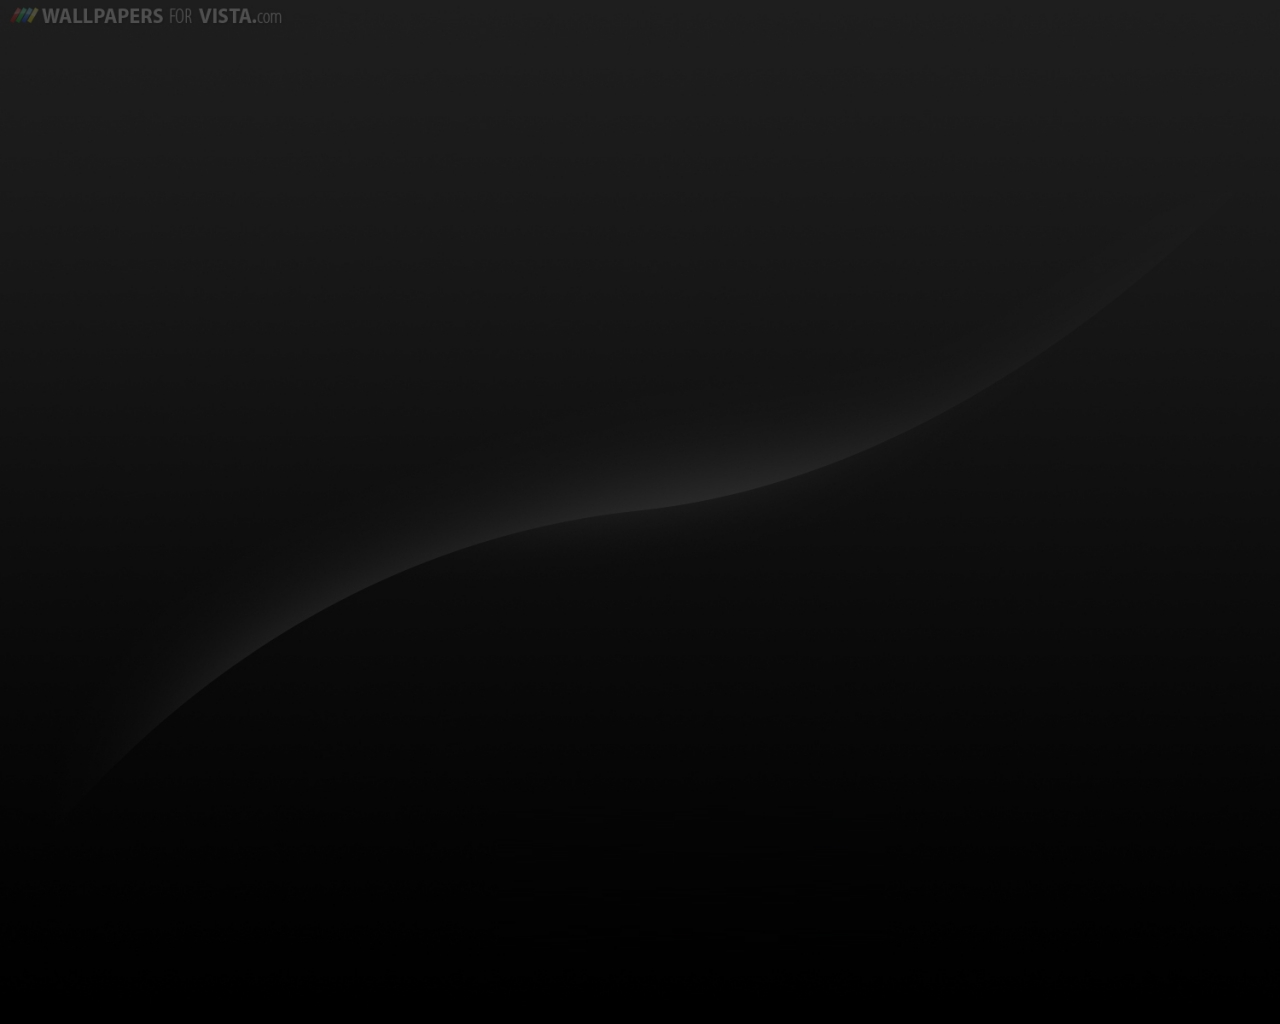 Info Wallpapers wallpaper black background 1280x1024